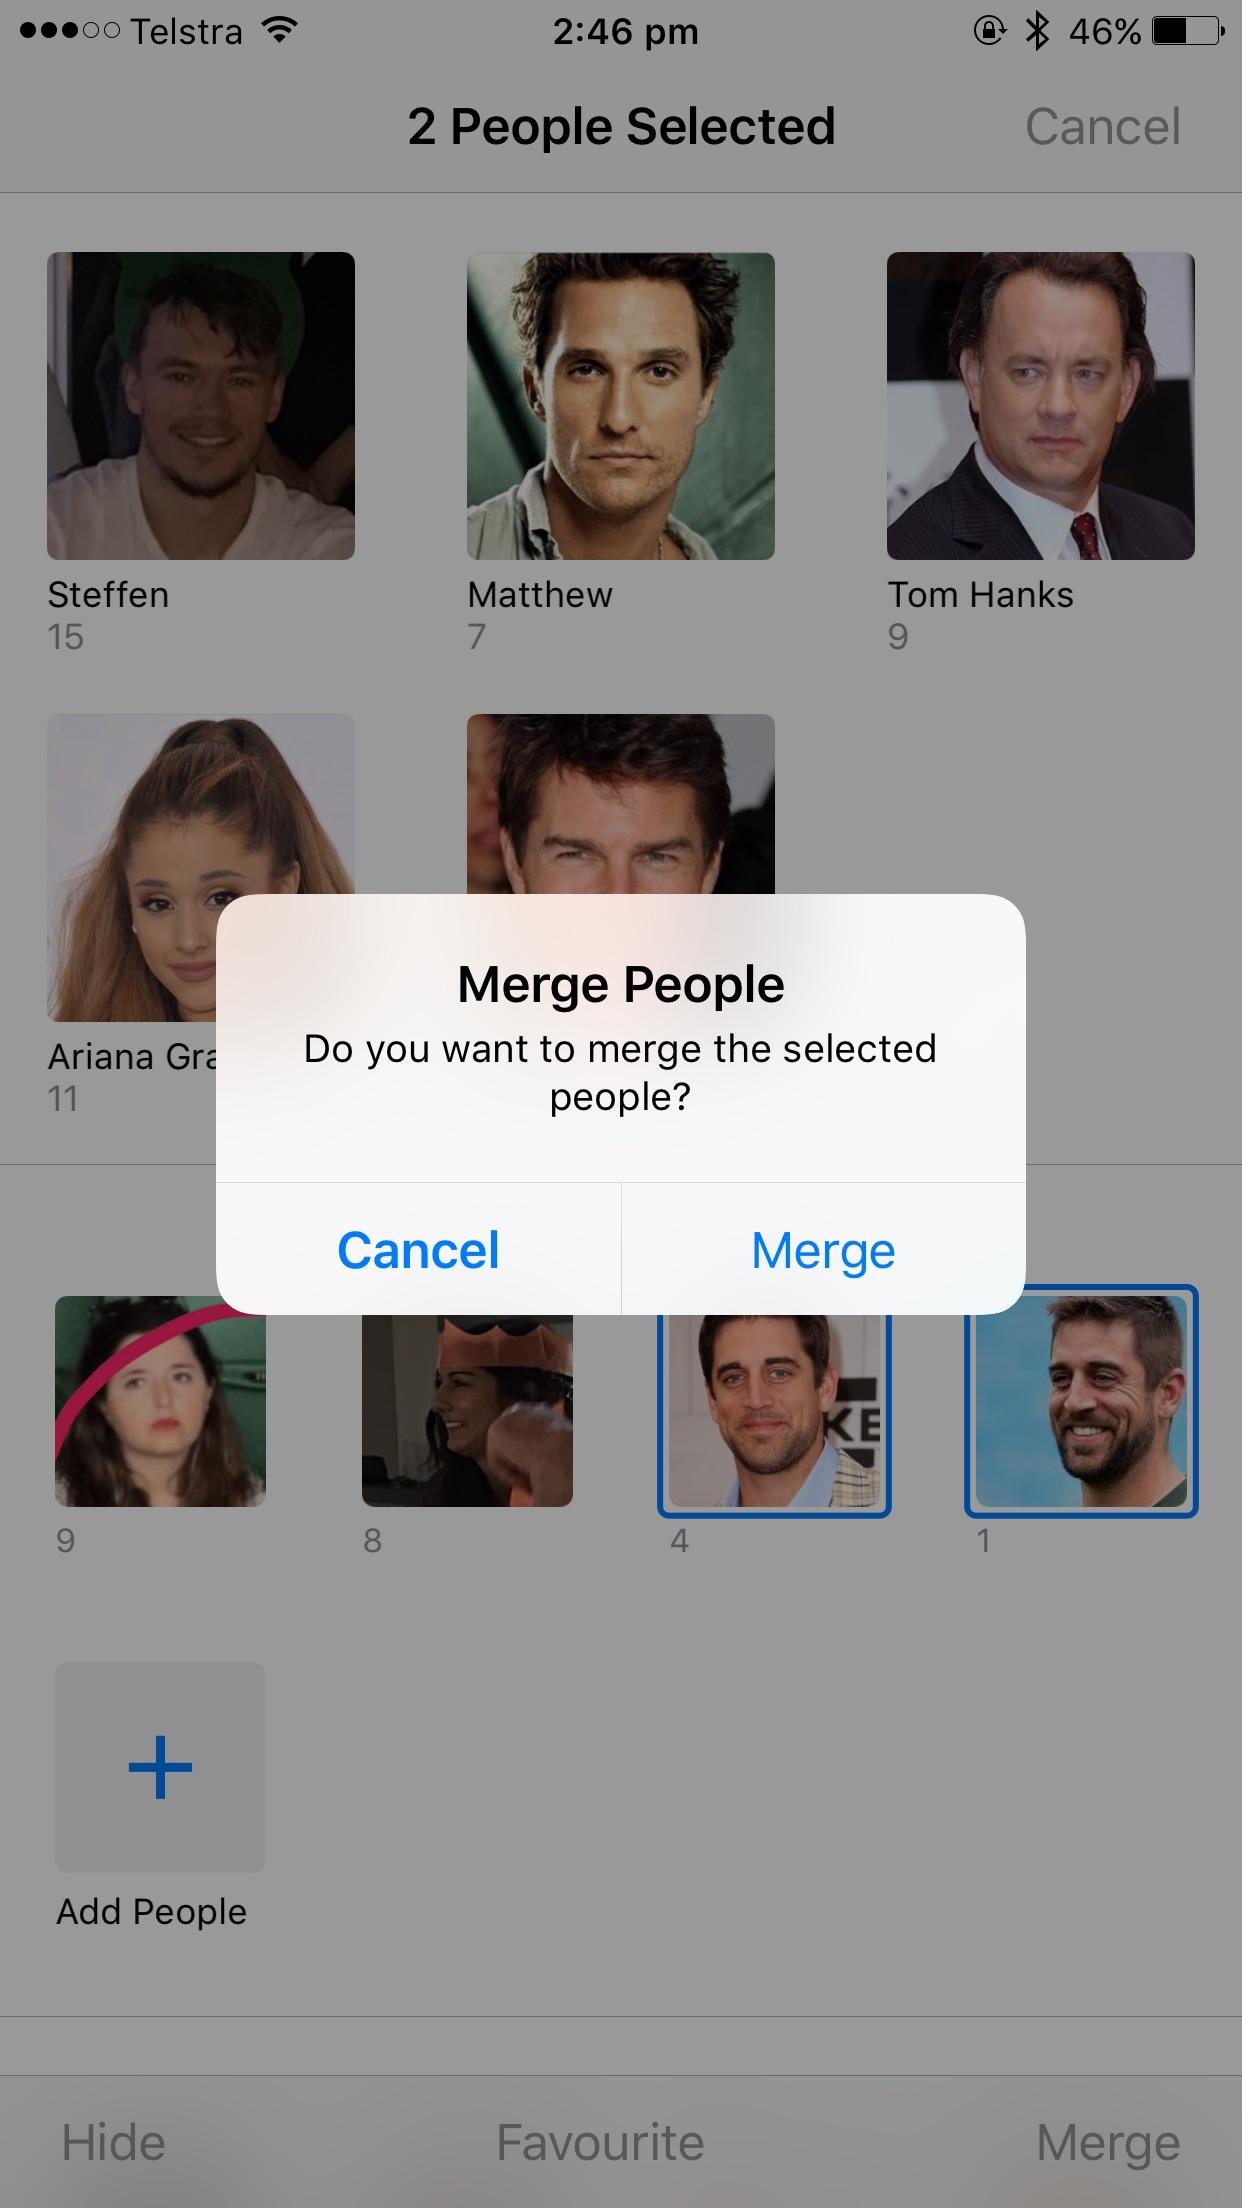 Confirm merging people